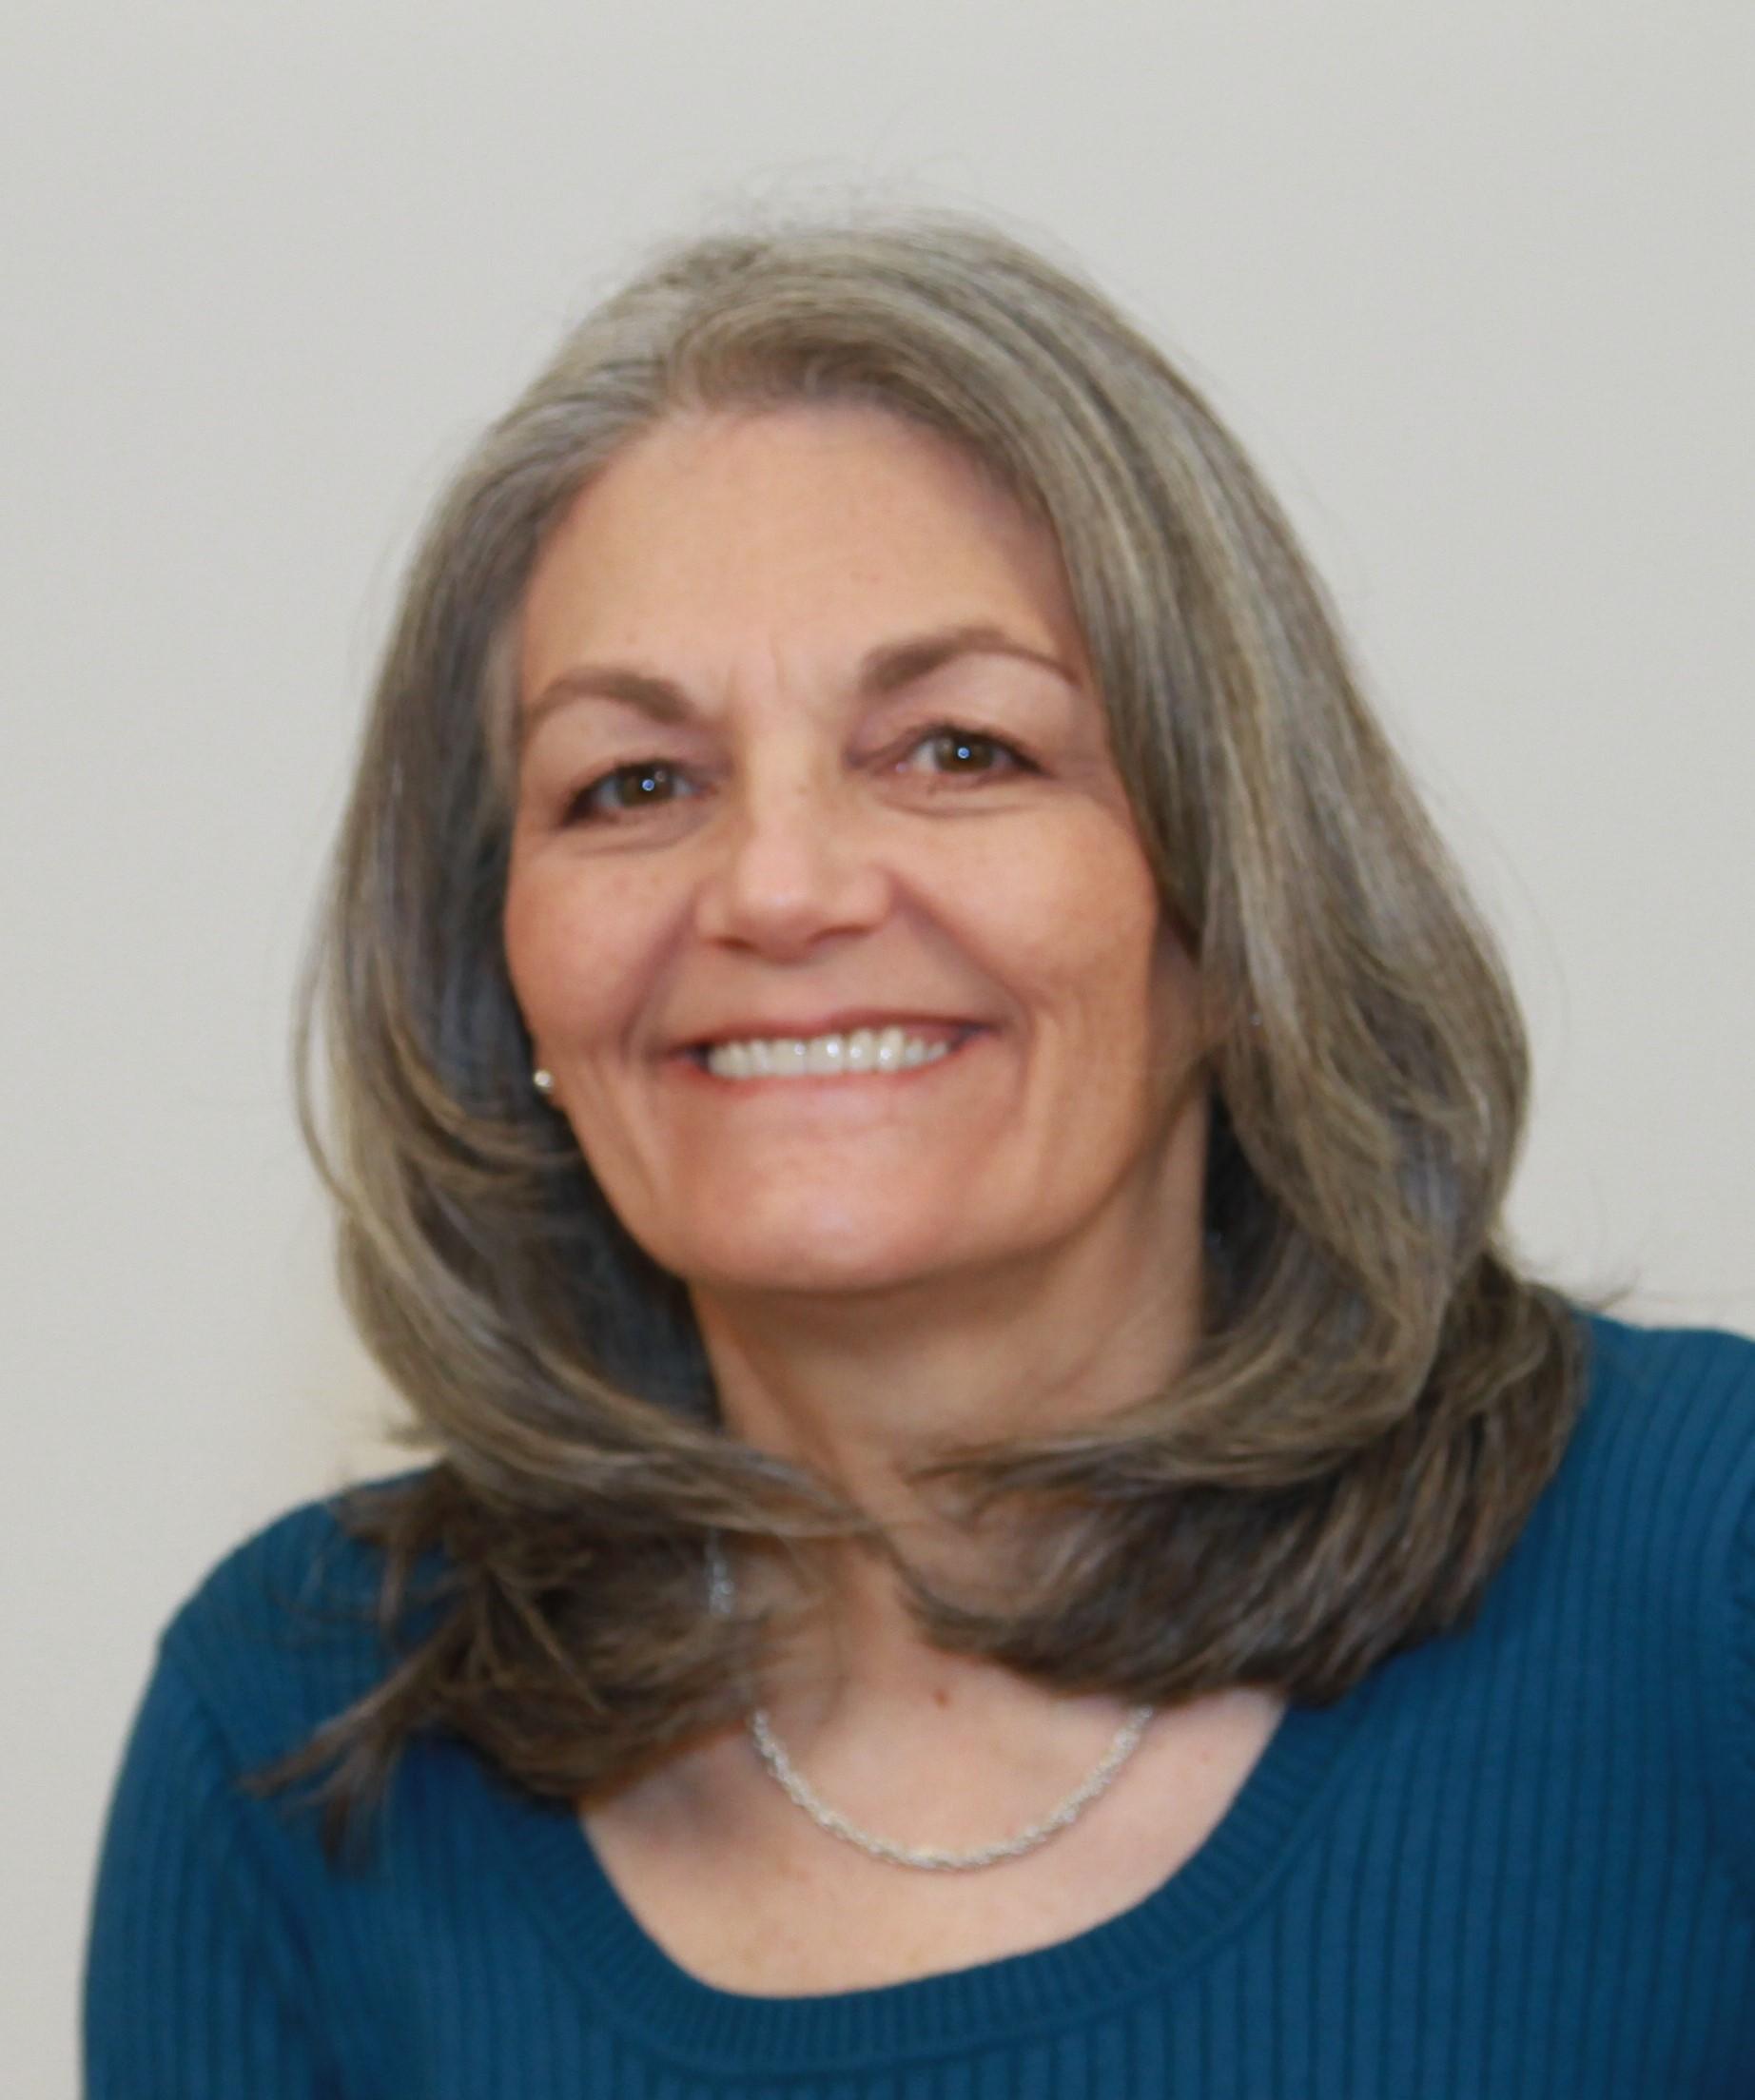 Margaret Piela